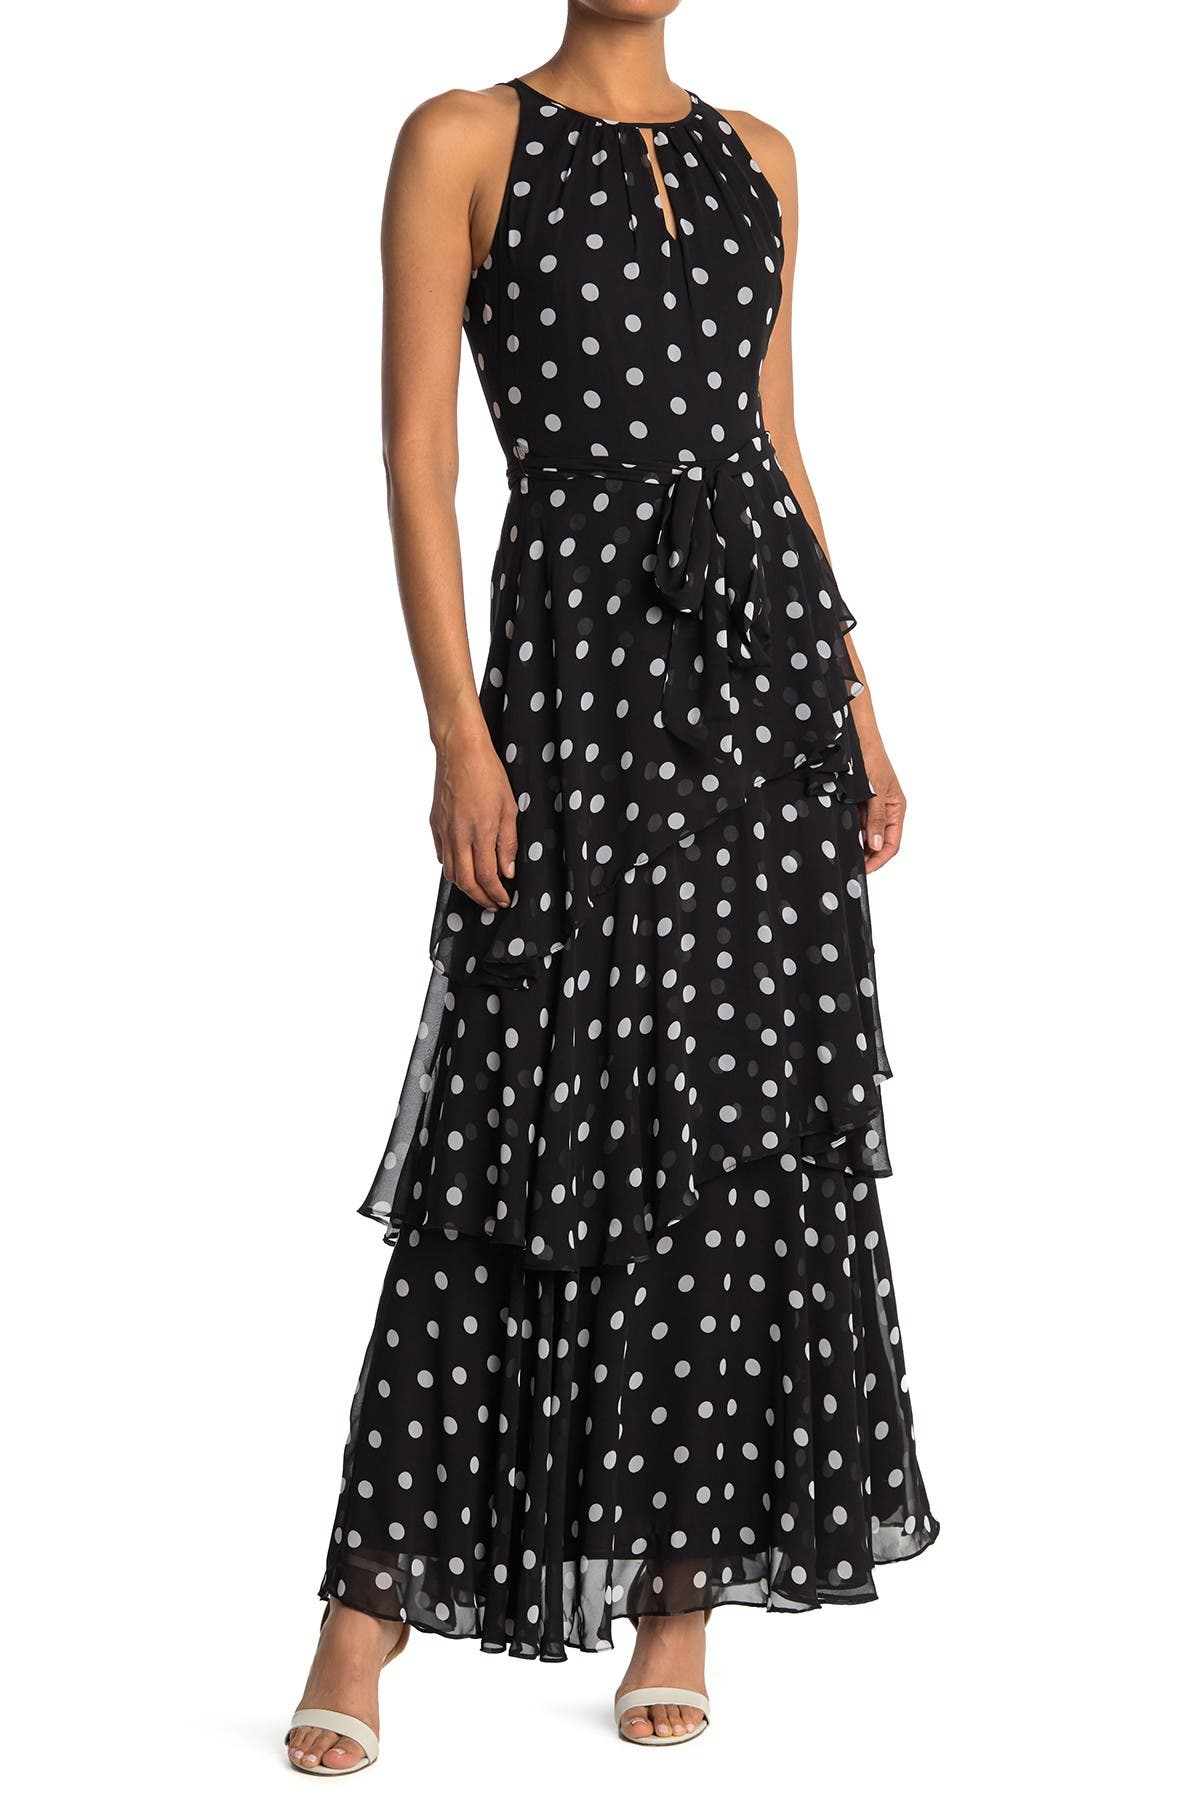 Image of Tahari Polka Dot Sleeveless Tiered Maxi Dress